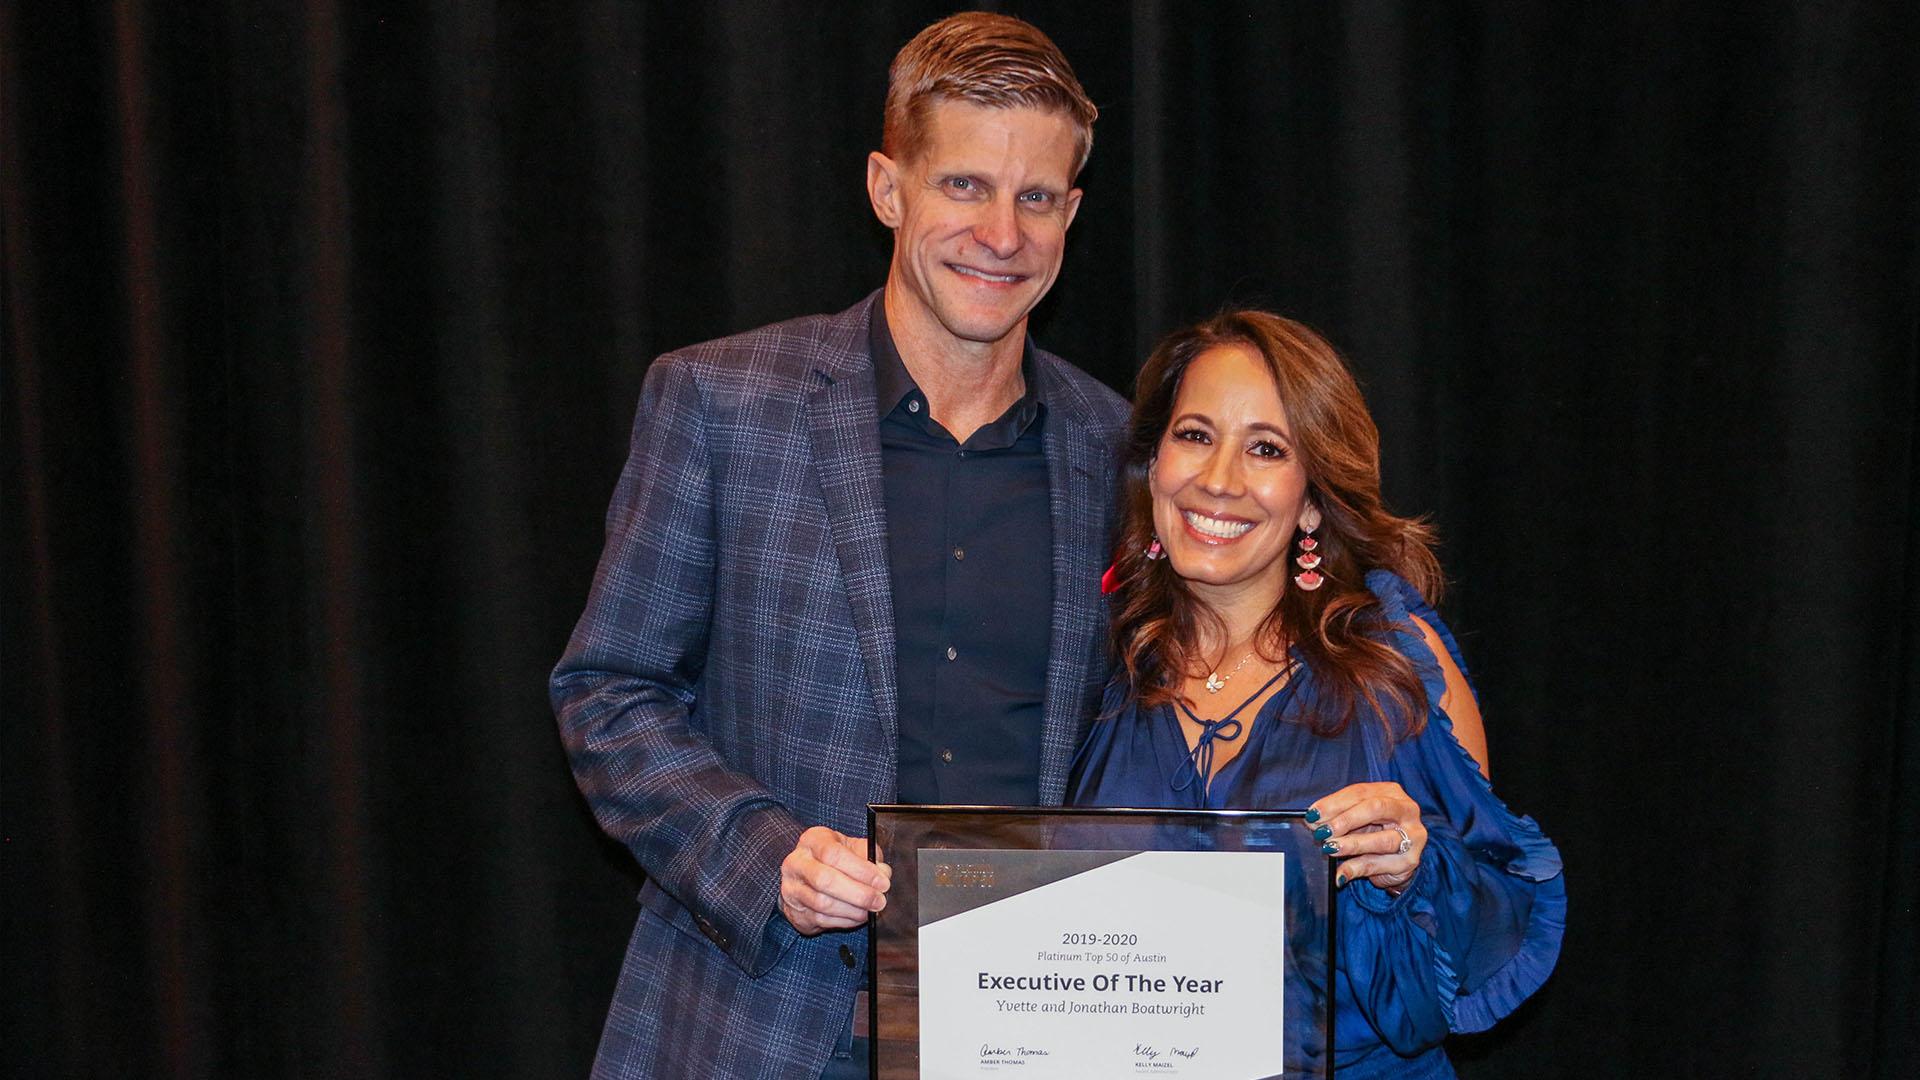 Image of Executive Leadership Award